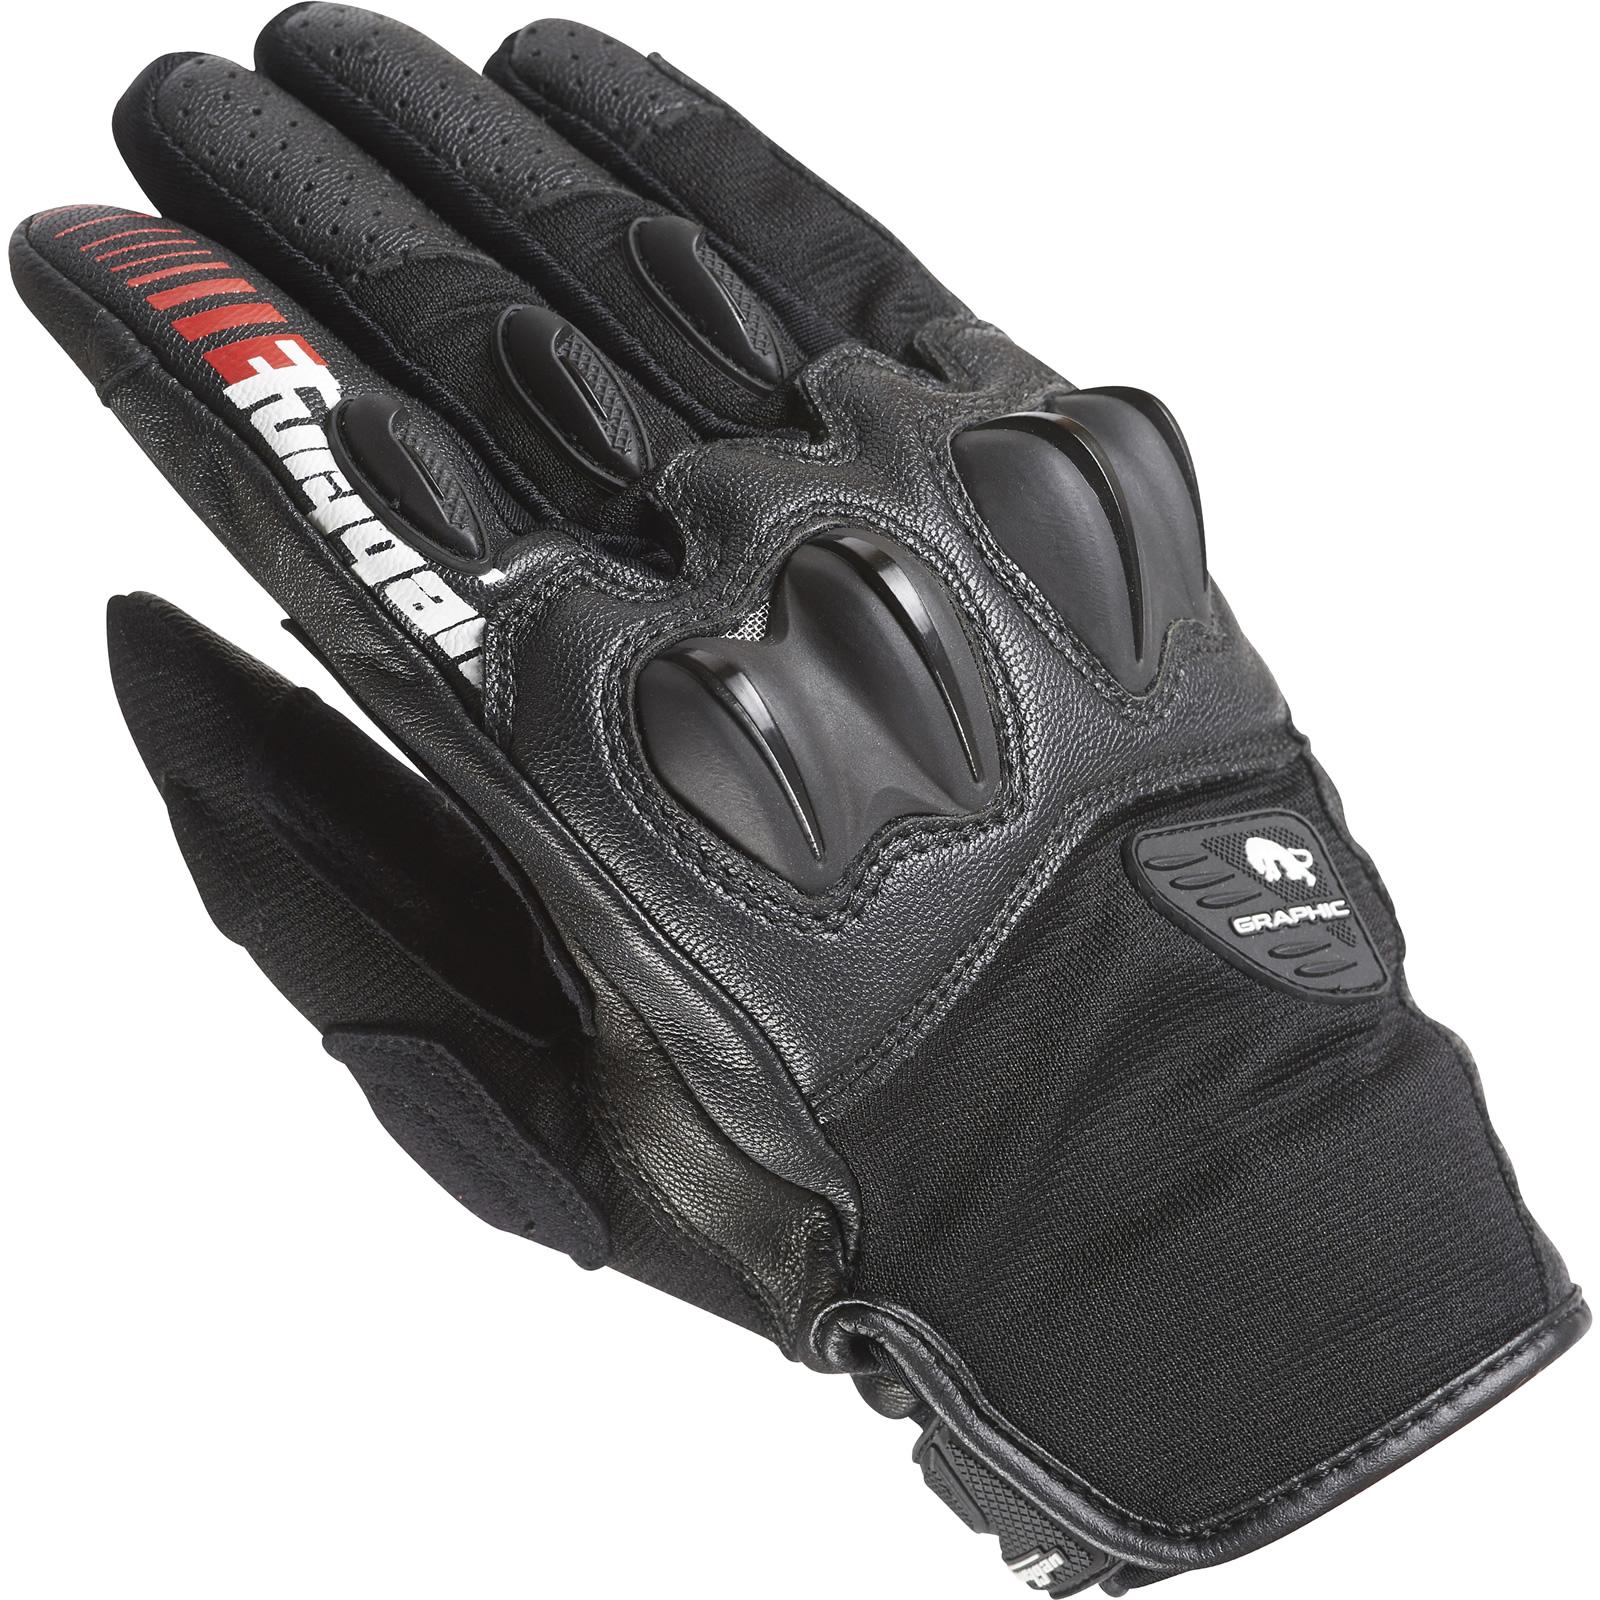 Furygan-Graphic-Evo-Motorcycle-Gloves-Short-Street-Sport-Motorbike-GhostBikes